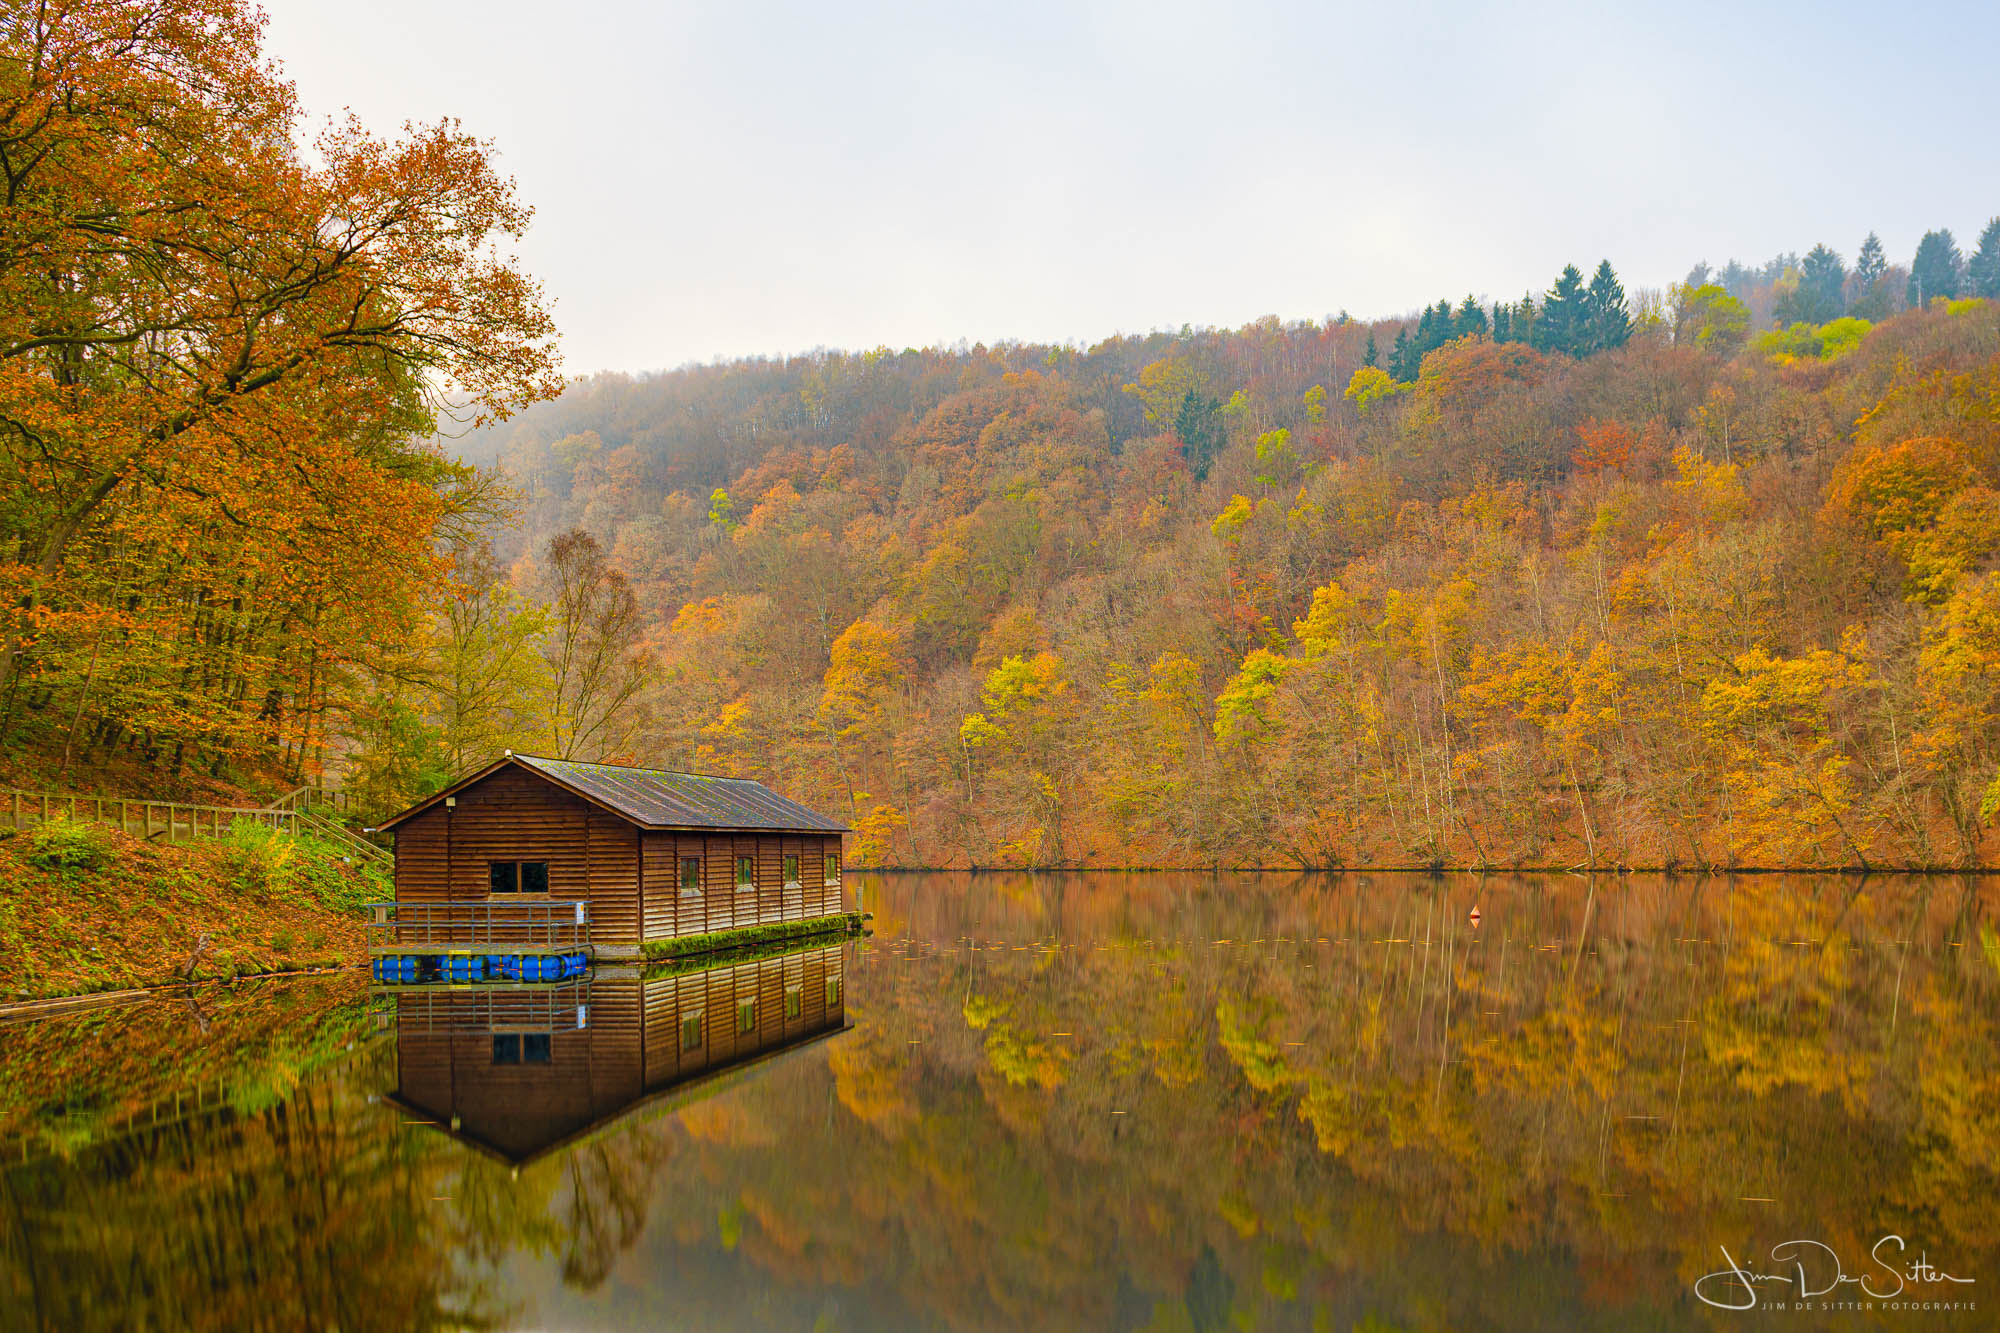 Lac de Nisramont, Belgium